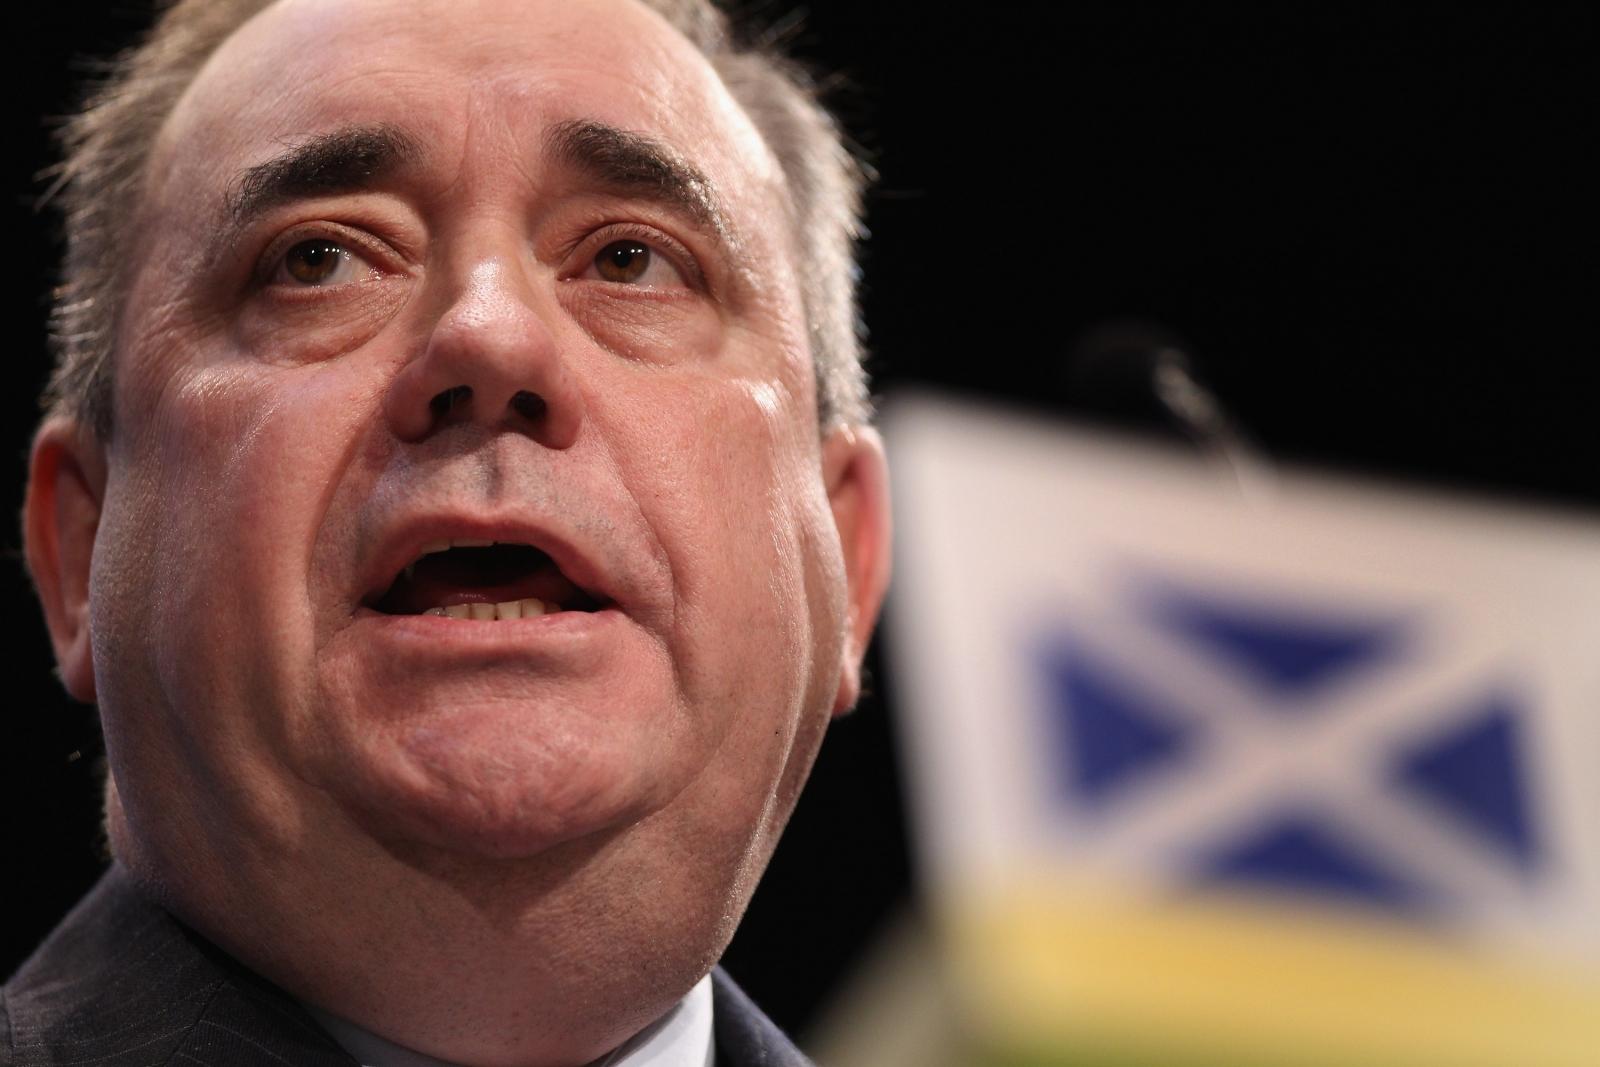 Alex Salmond SNP Leader